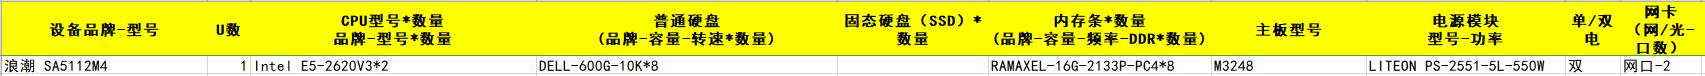 浪潮 SA5112M4 Intel E5-2620V3*2 DELL-600G-10K*8 RAMAXEL-16G-2133P-PC4*8